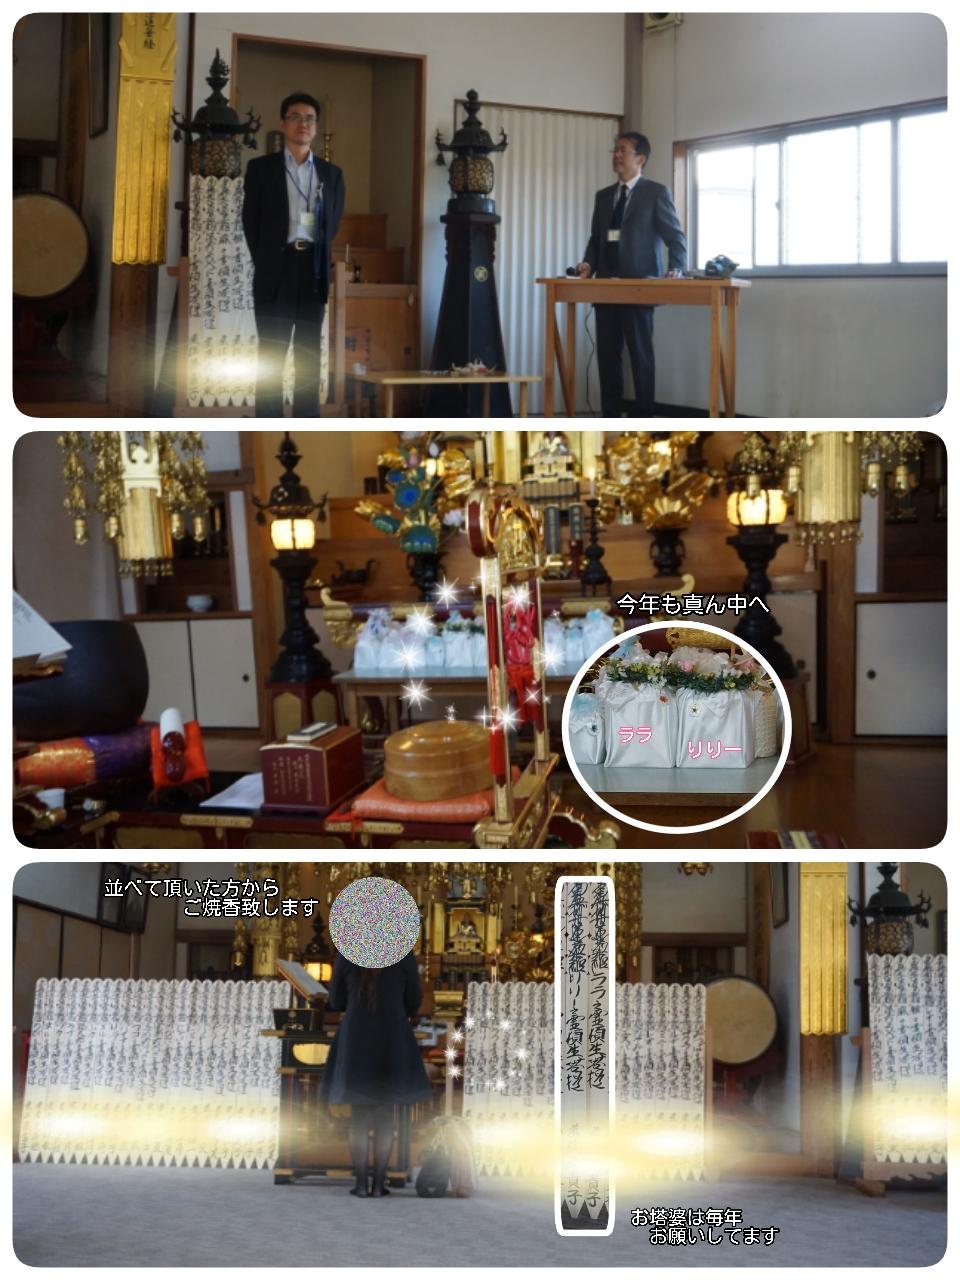 16-10-15-22-03-19-968_deco.jpg